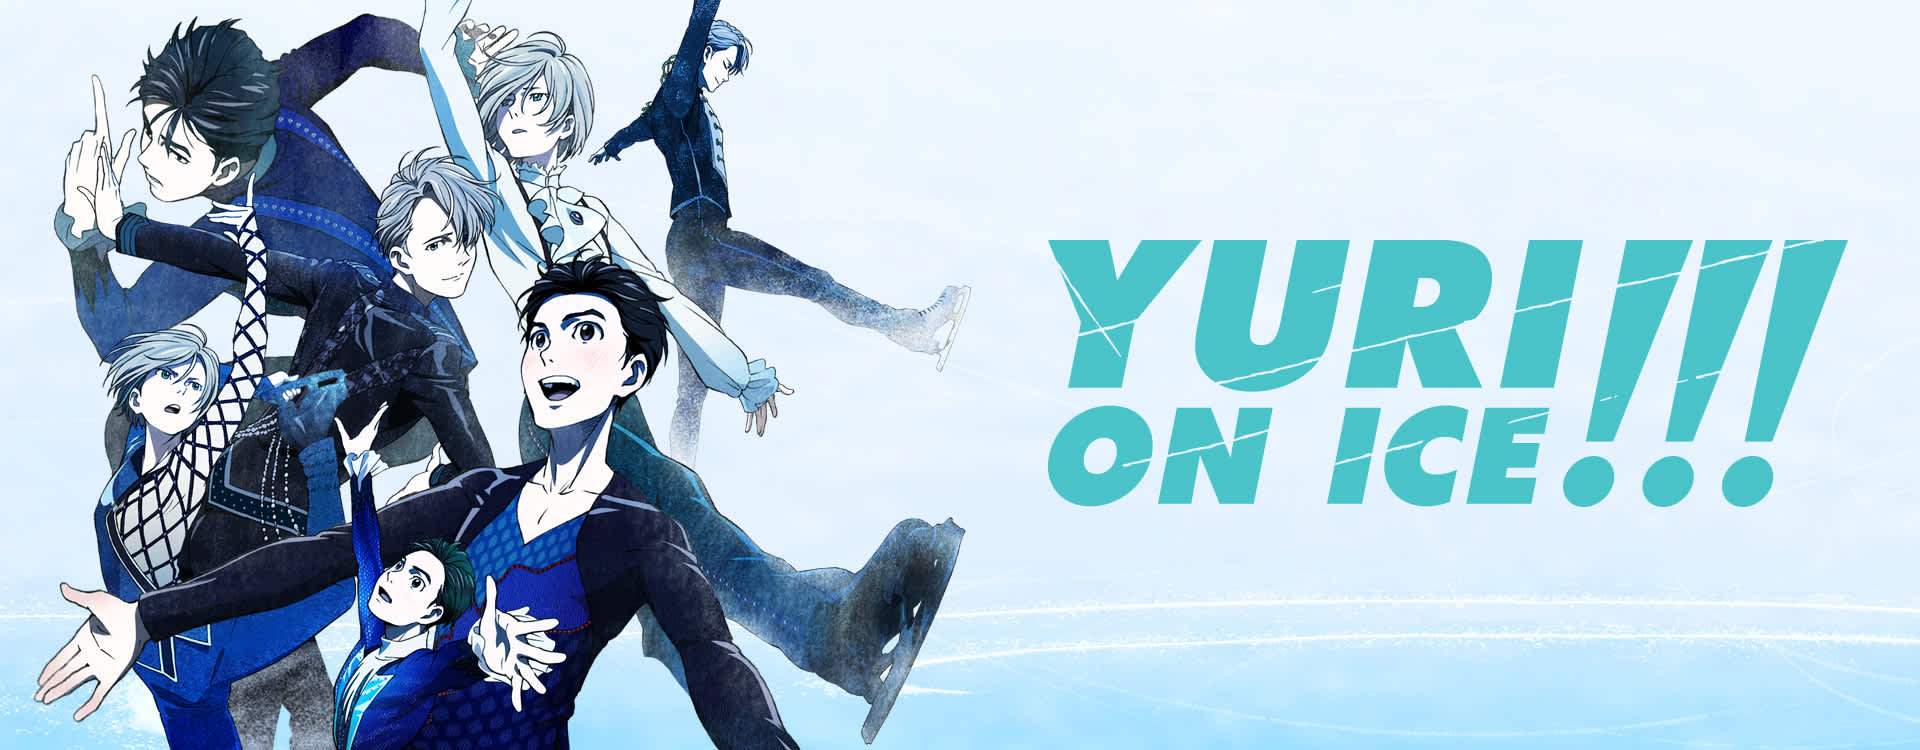 (L-R middle row) Yurio, Victor, and Yuri